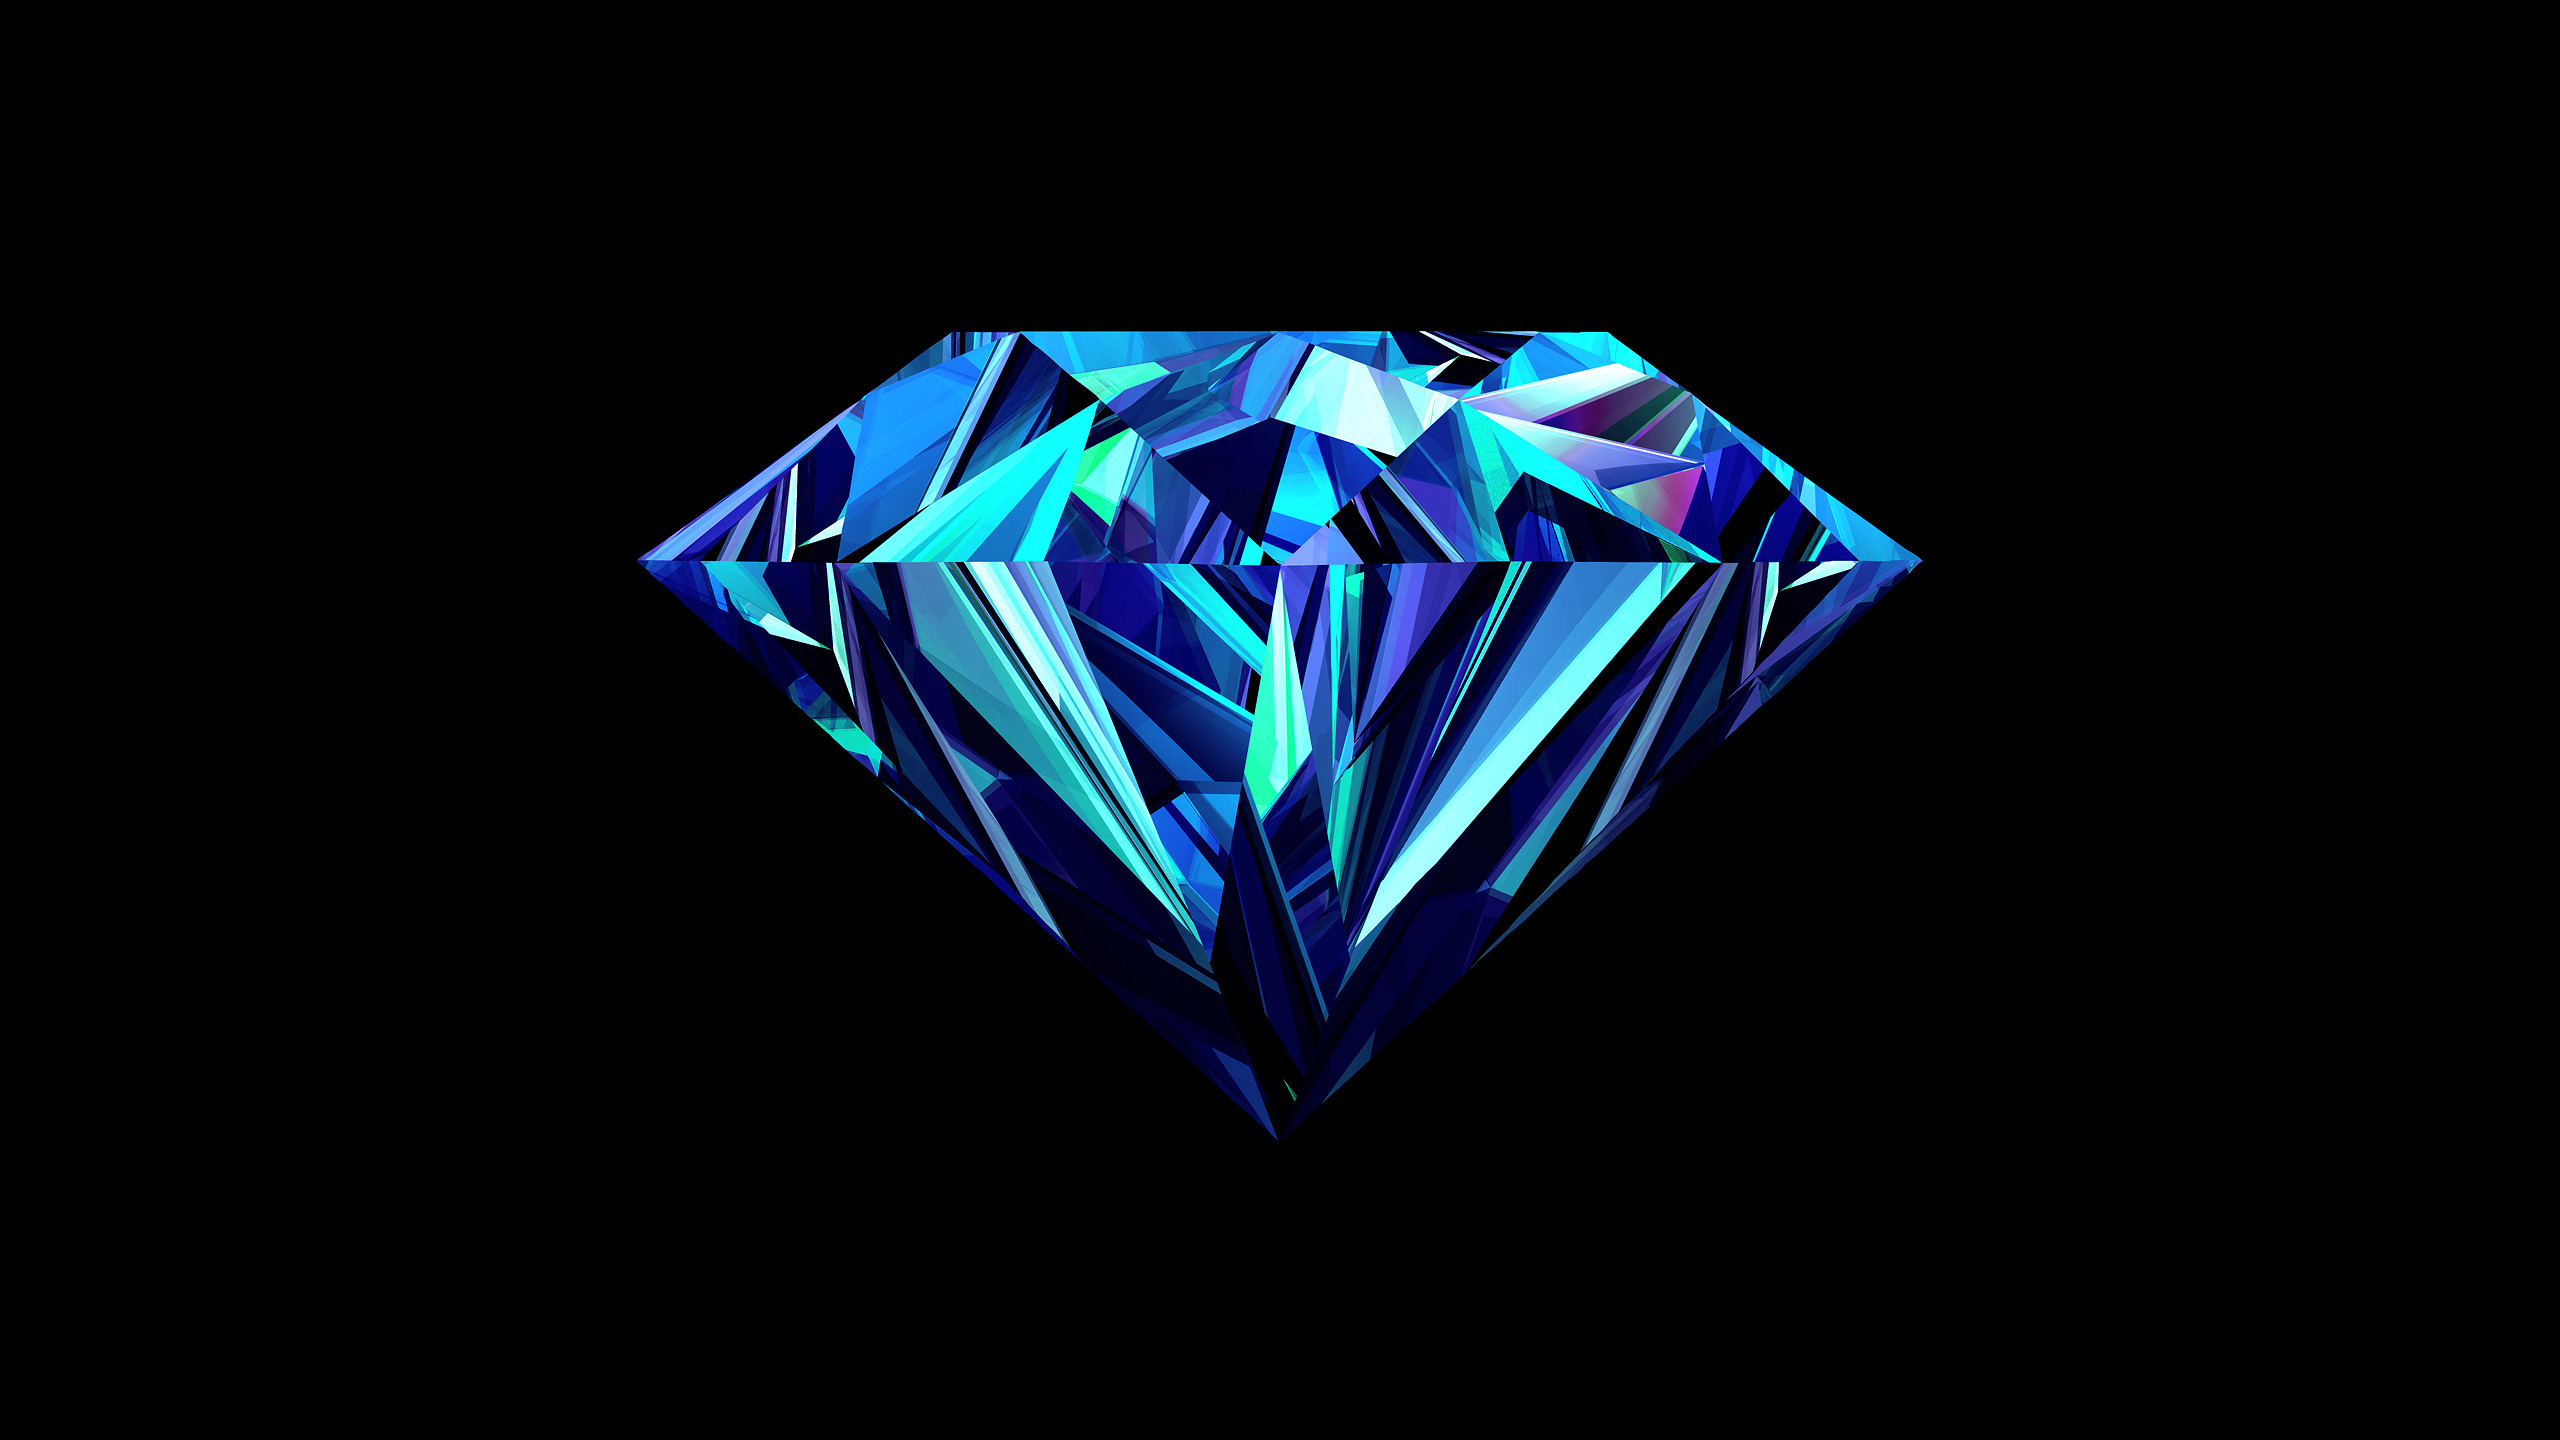 Diamond background wallpaper